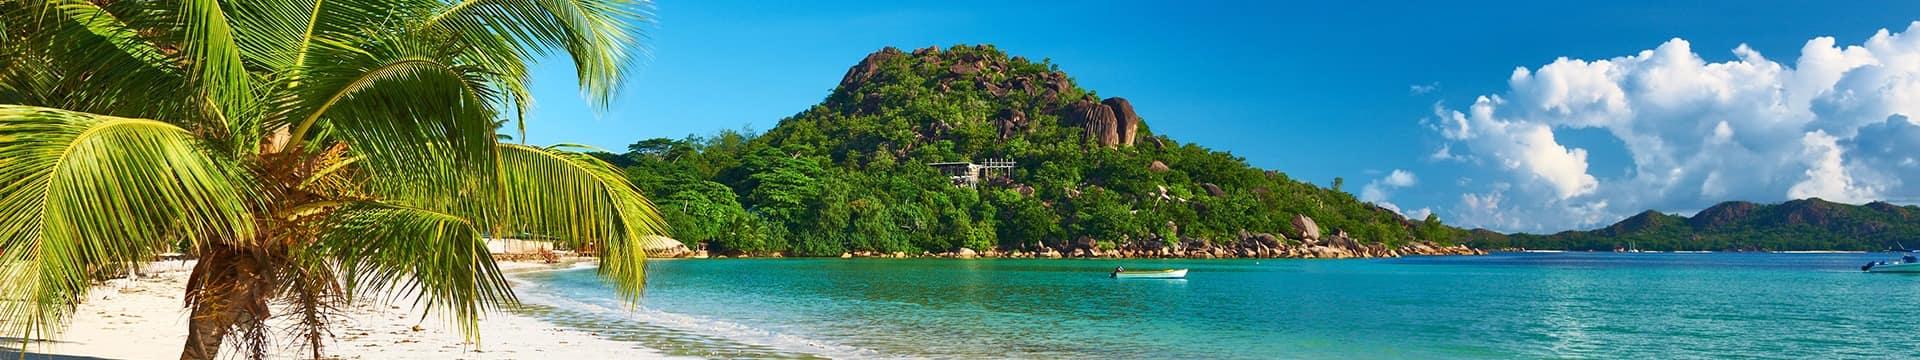 Seychelles | Pacotes Kangaroo Tours